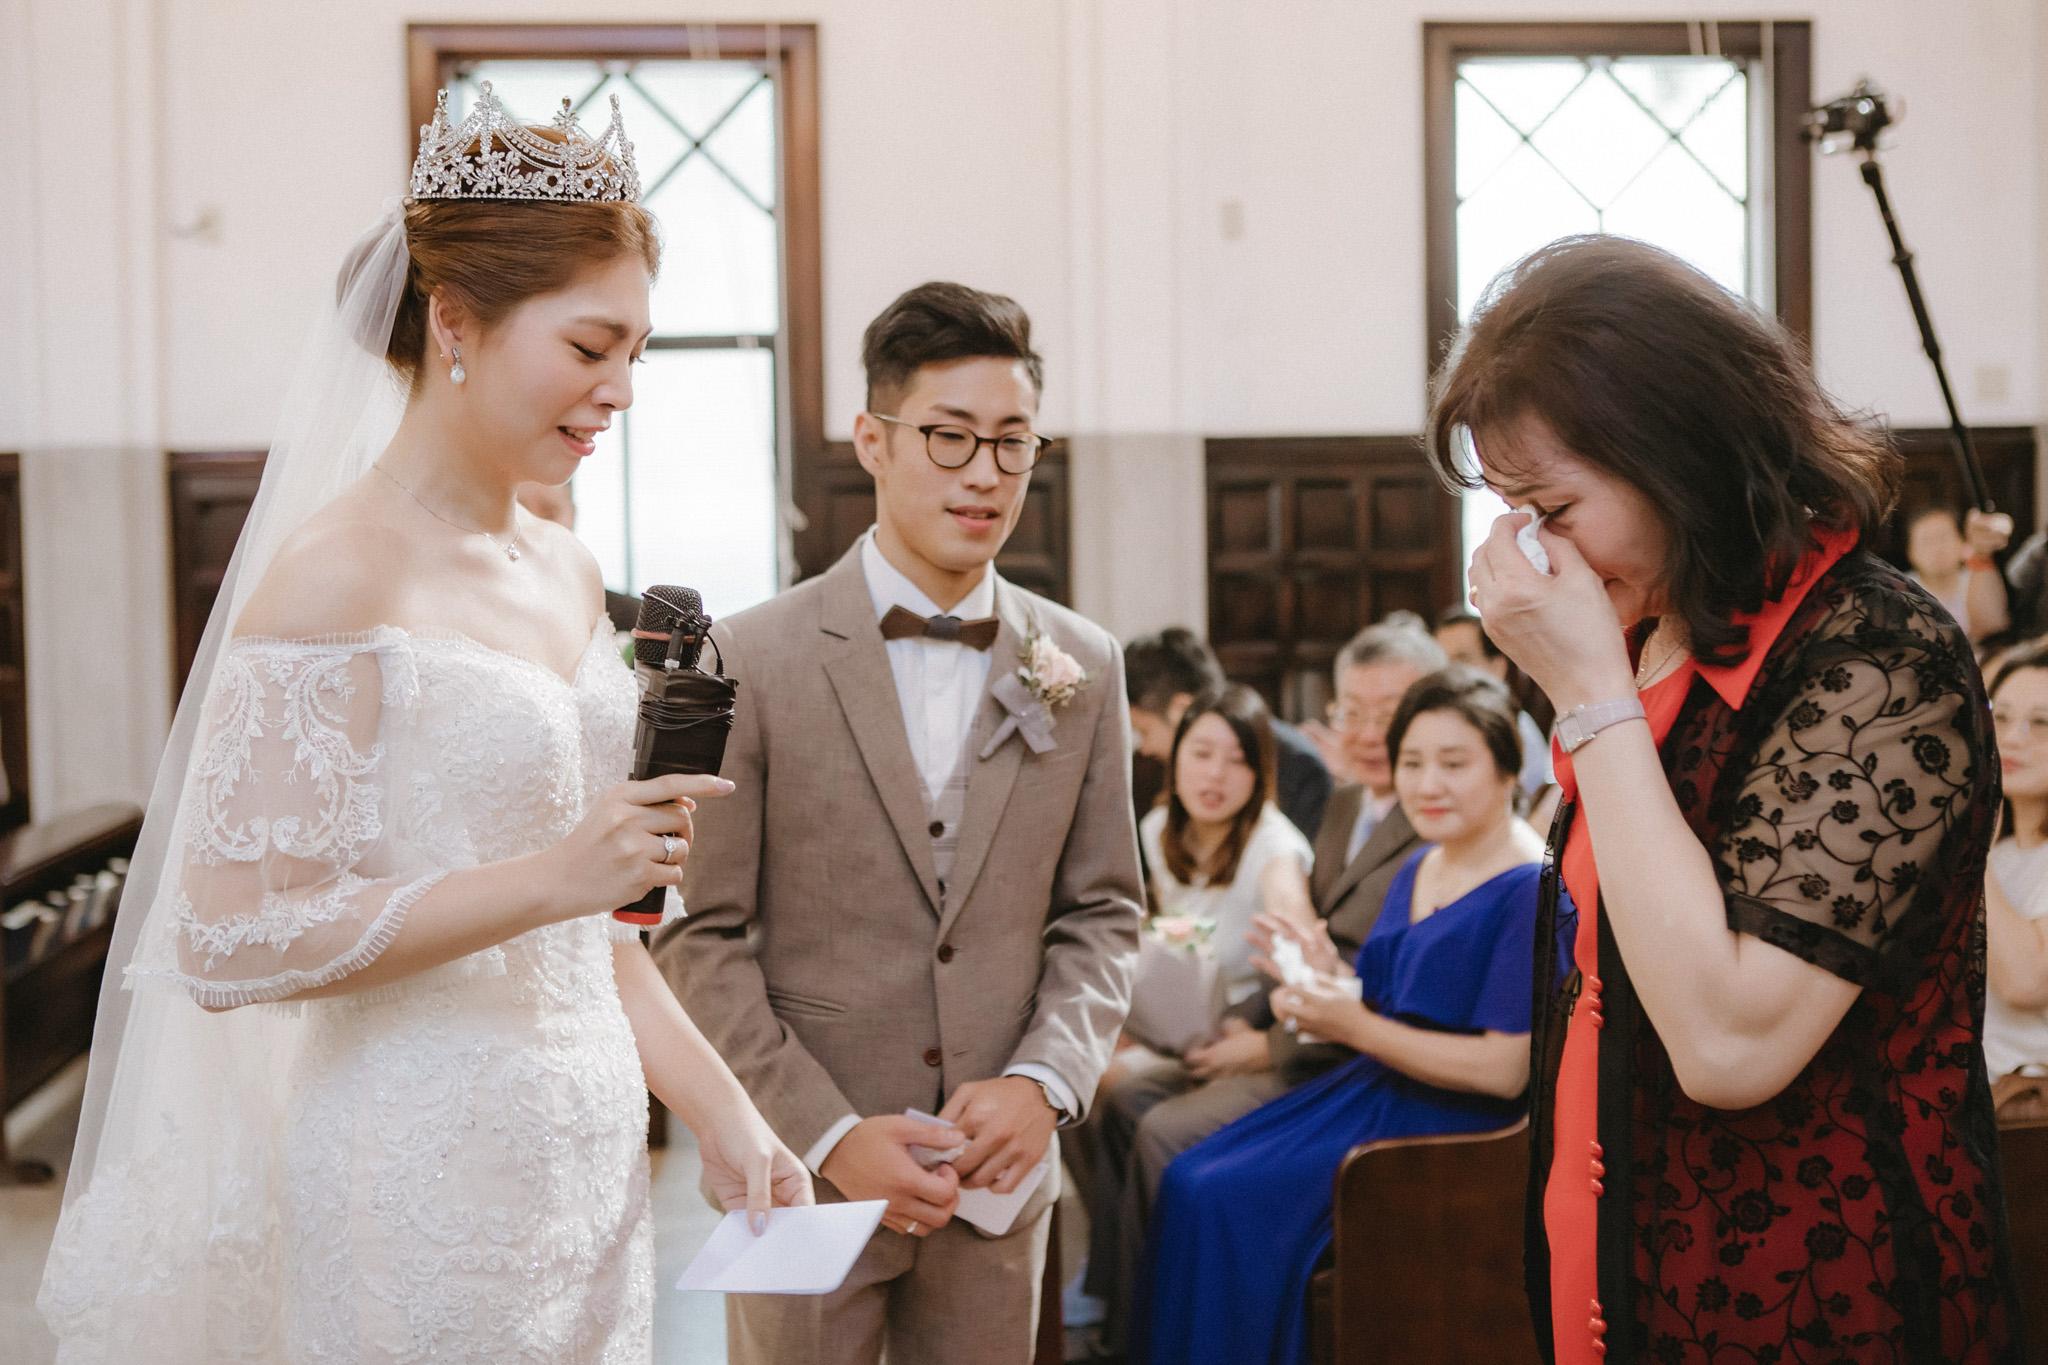 EW 台北婚攝 居米 濟南教會 Brick Yard 33 美軍俱樂部 婚禮 婚宴-42